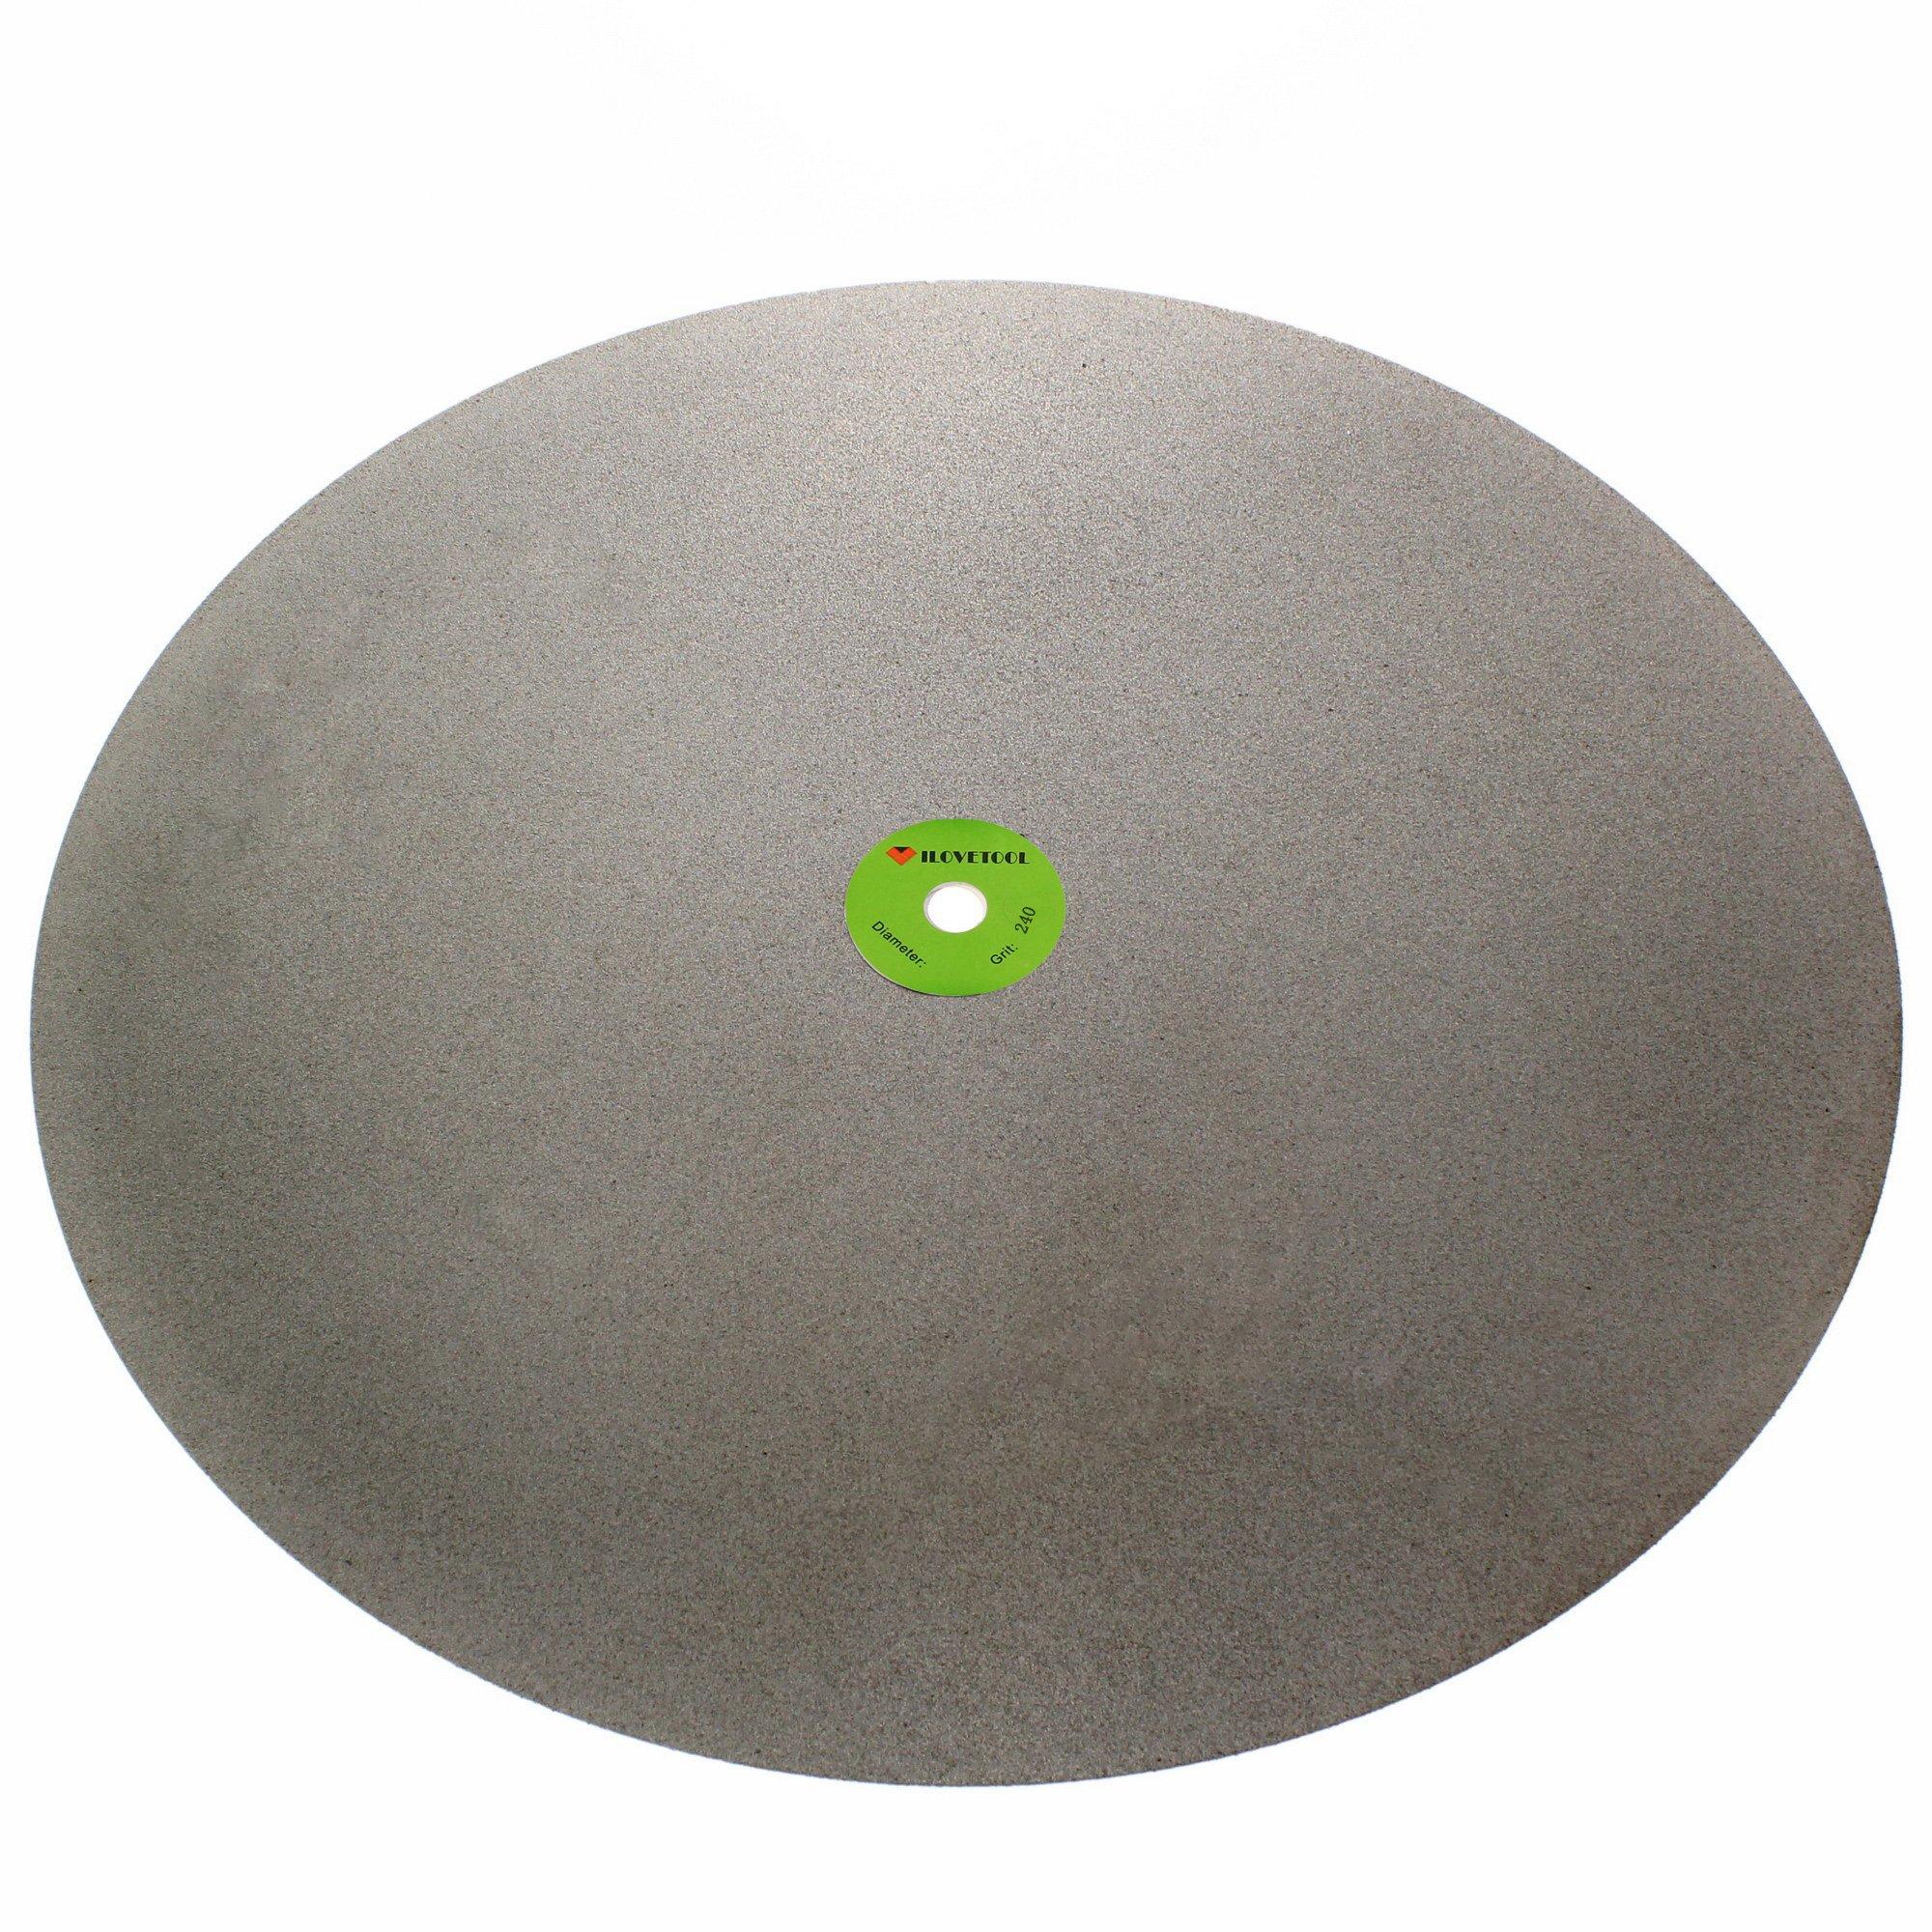 ILOVETOOL 400mm Electroplated Diamond Discs Abrasive Wheel 240 Grit Stone Tools